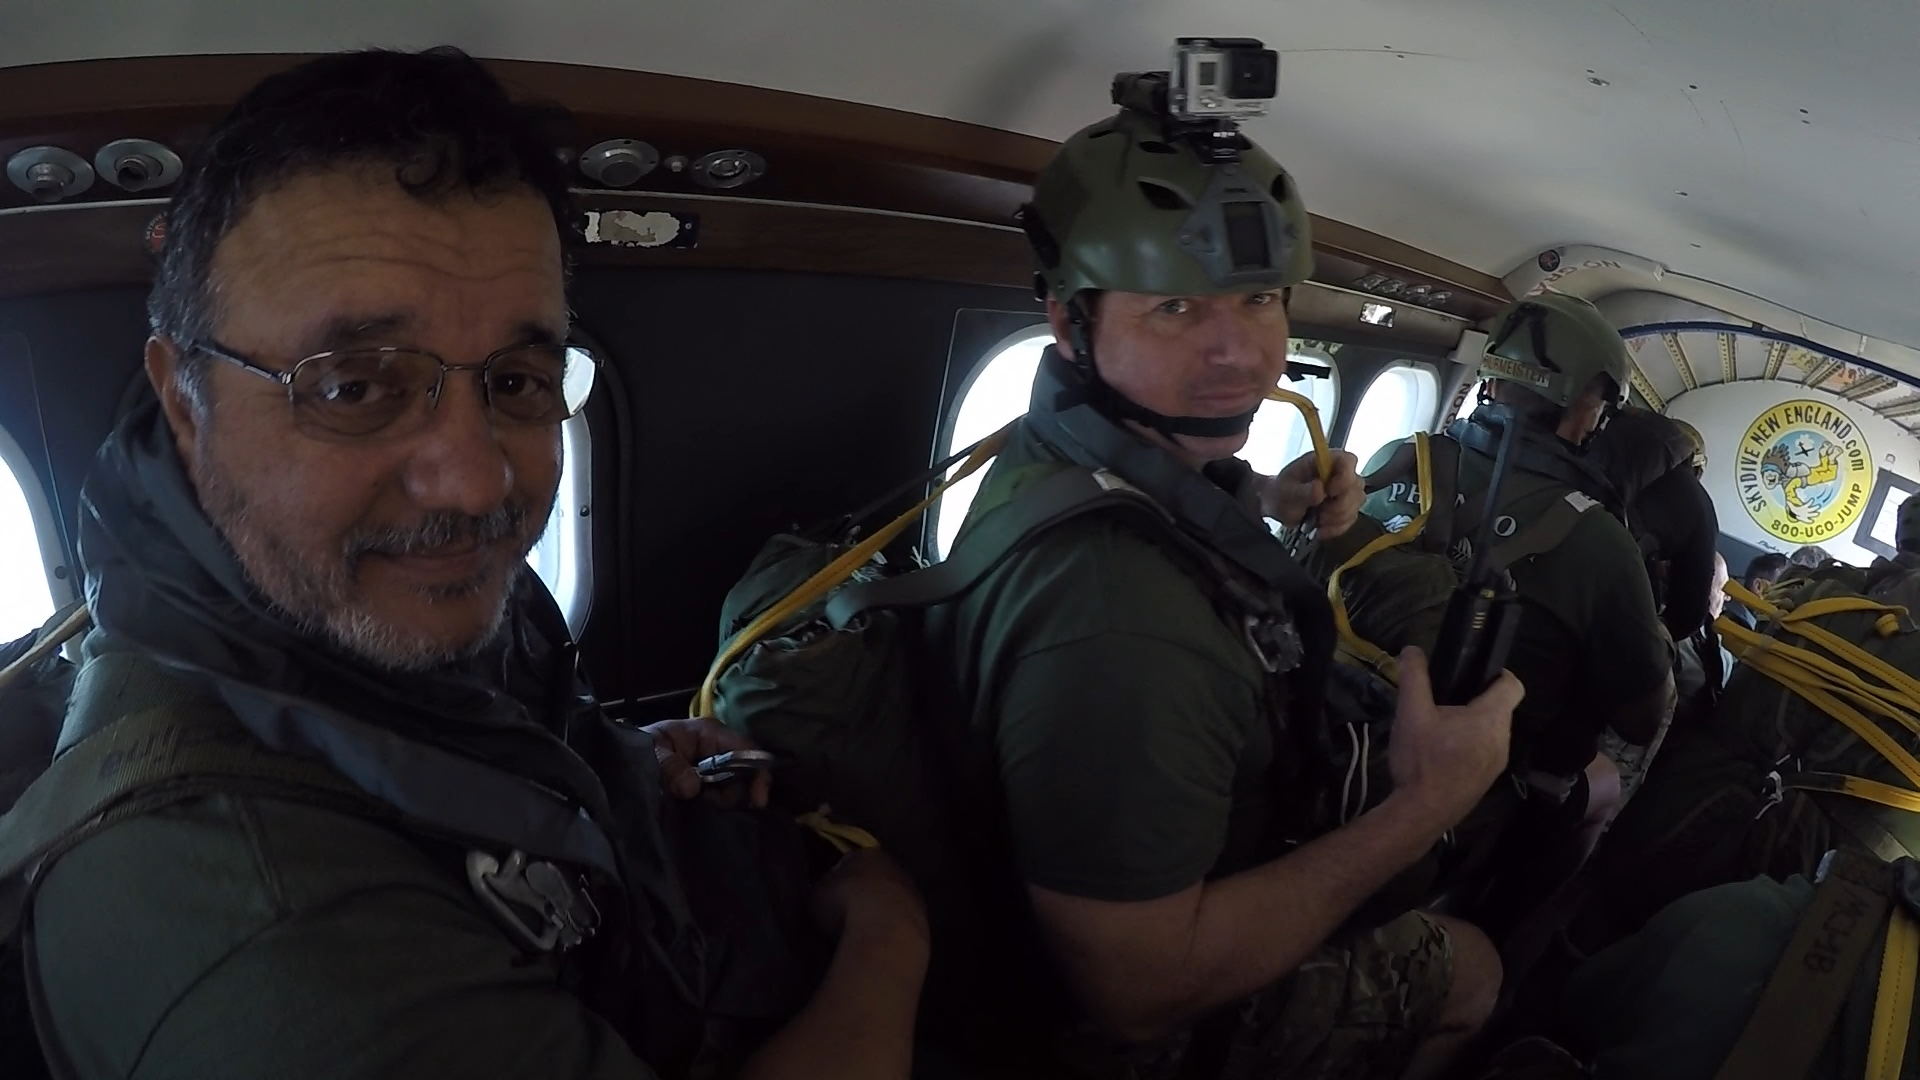 Airborne - 160409 - Andy-Brian.jpg